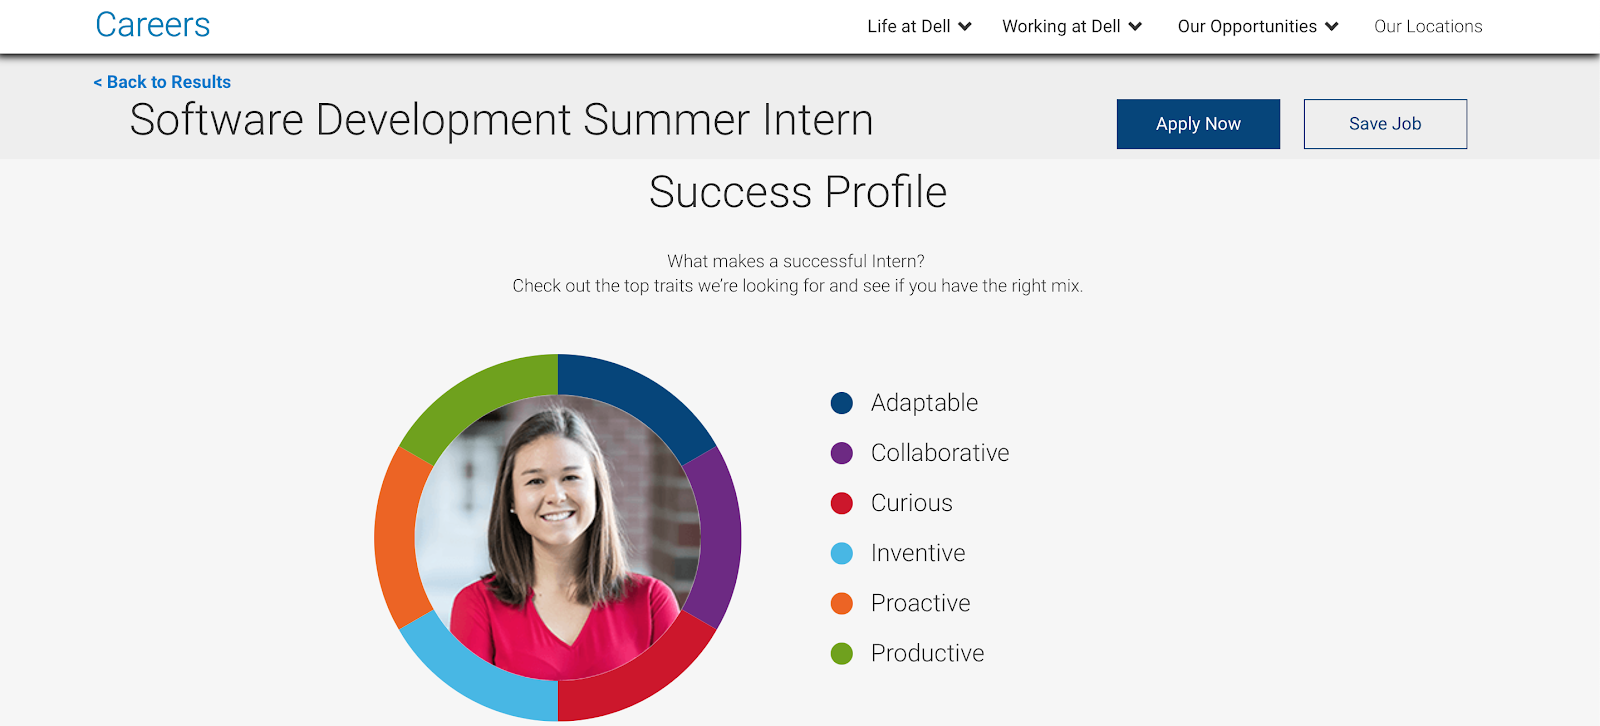 Dell internships: screenshot of a success profile